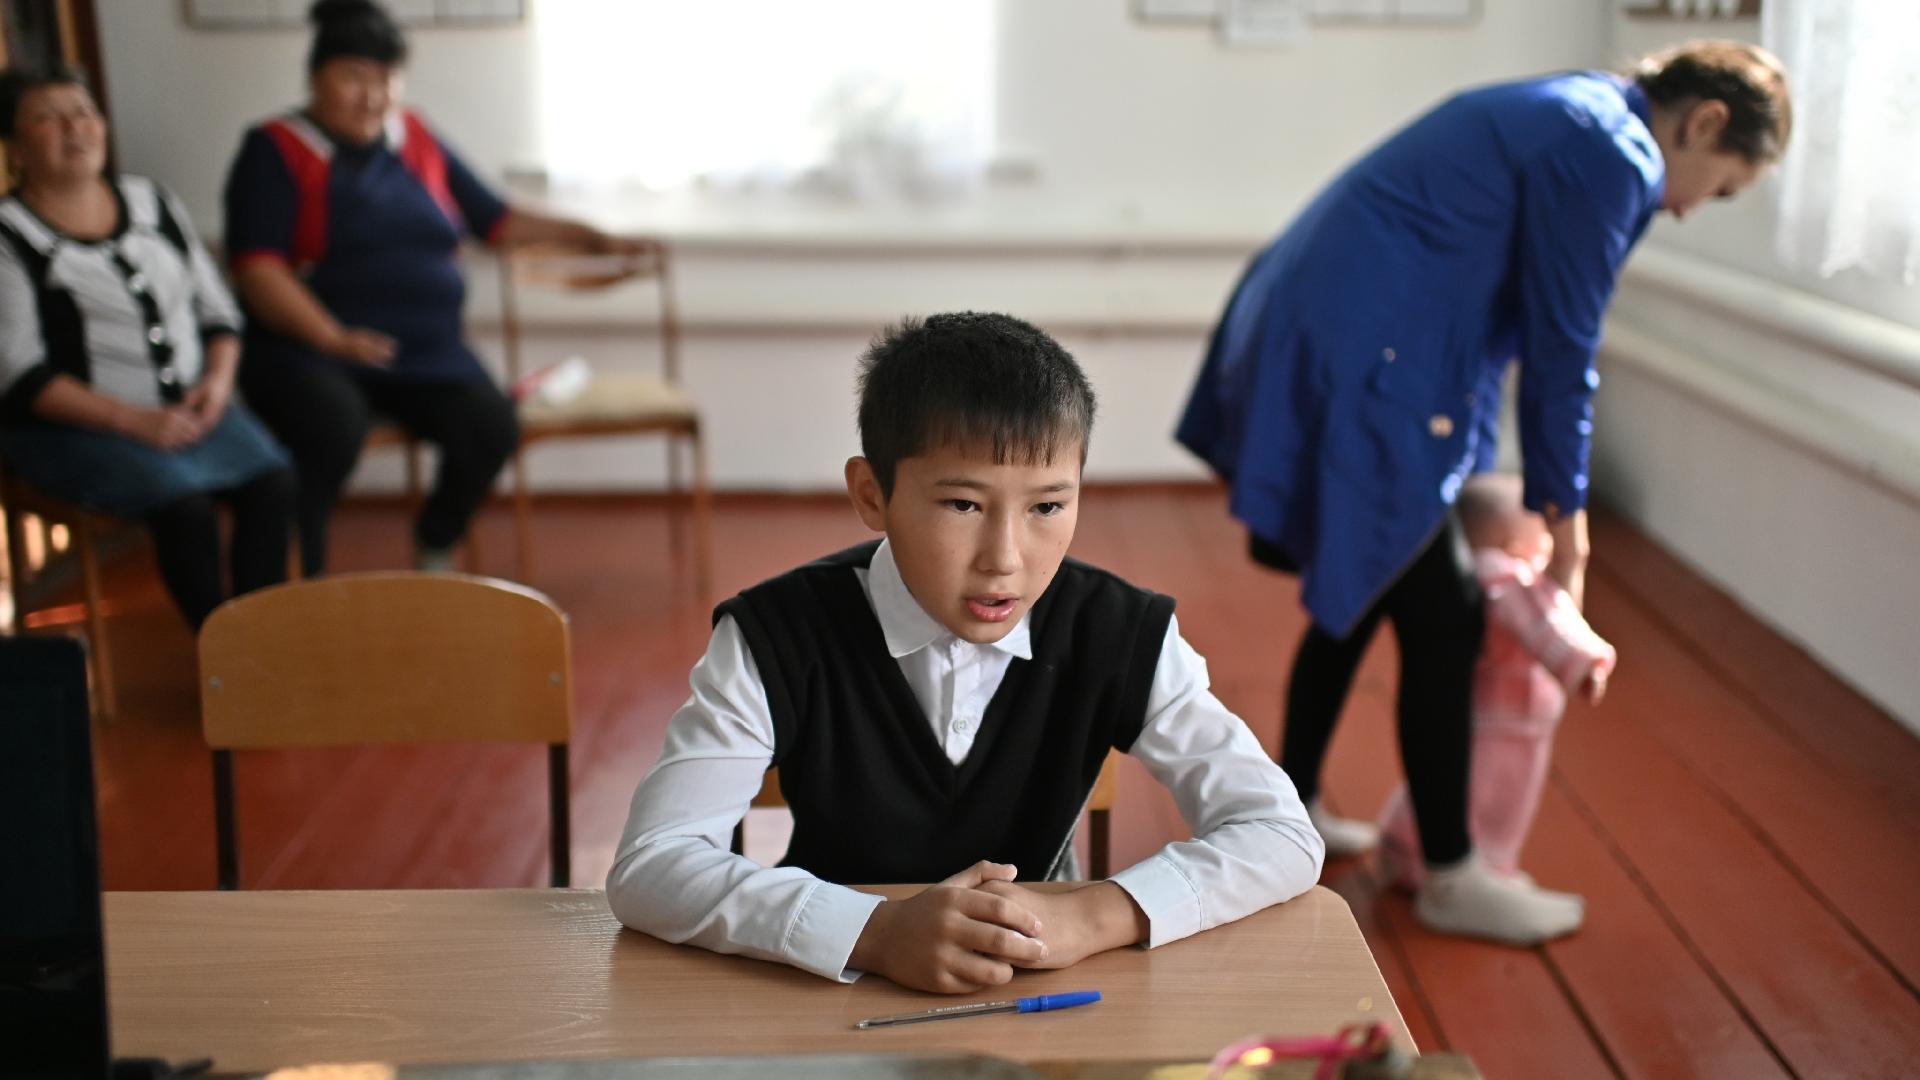 Reuters/ Alexey Malgavko